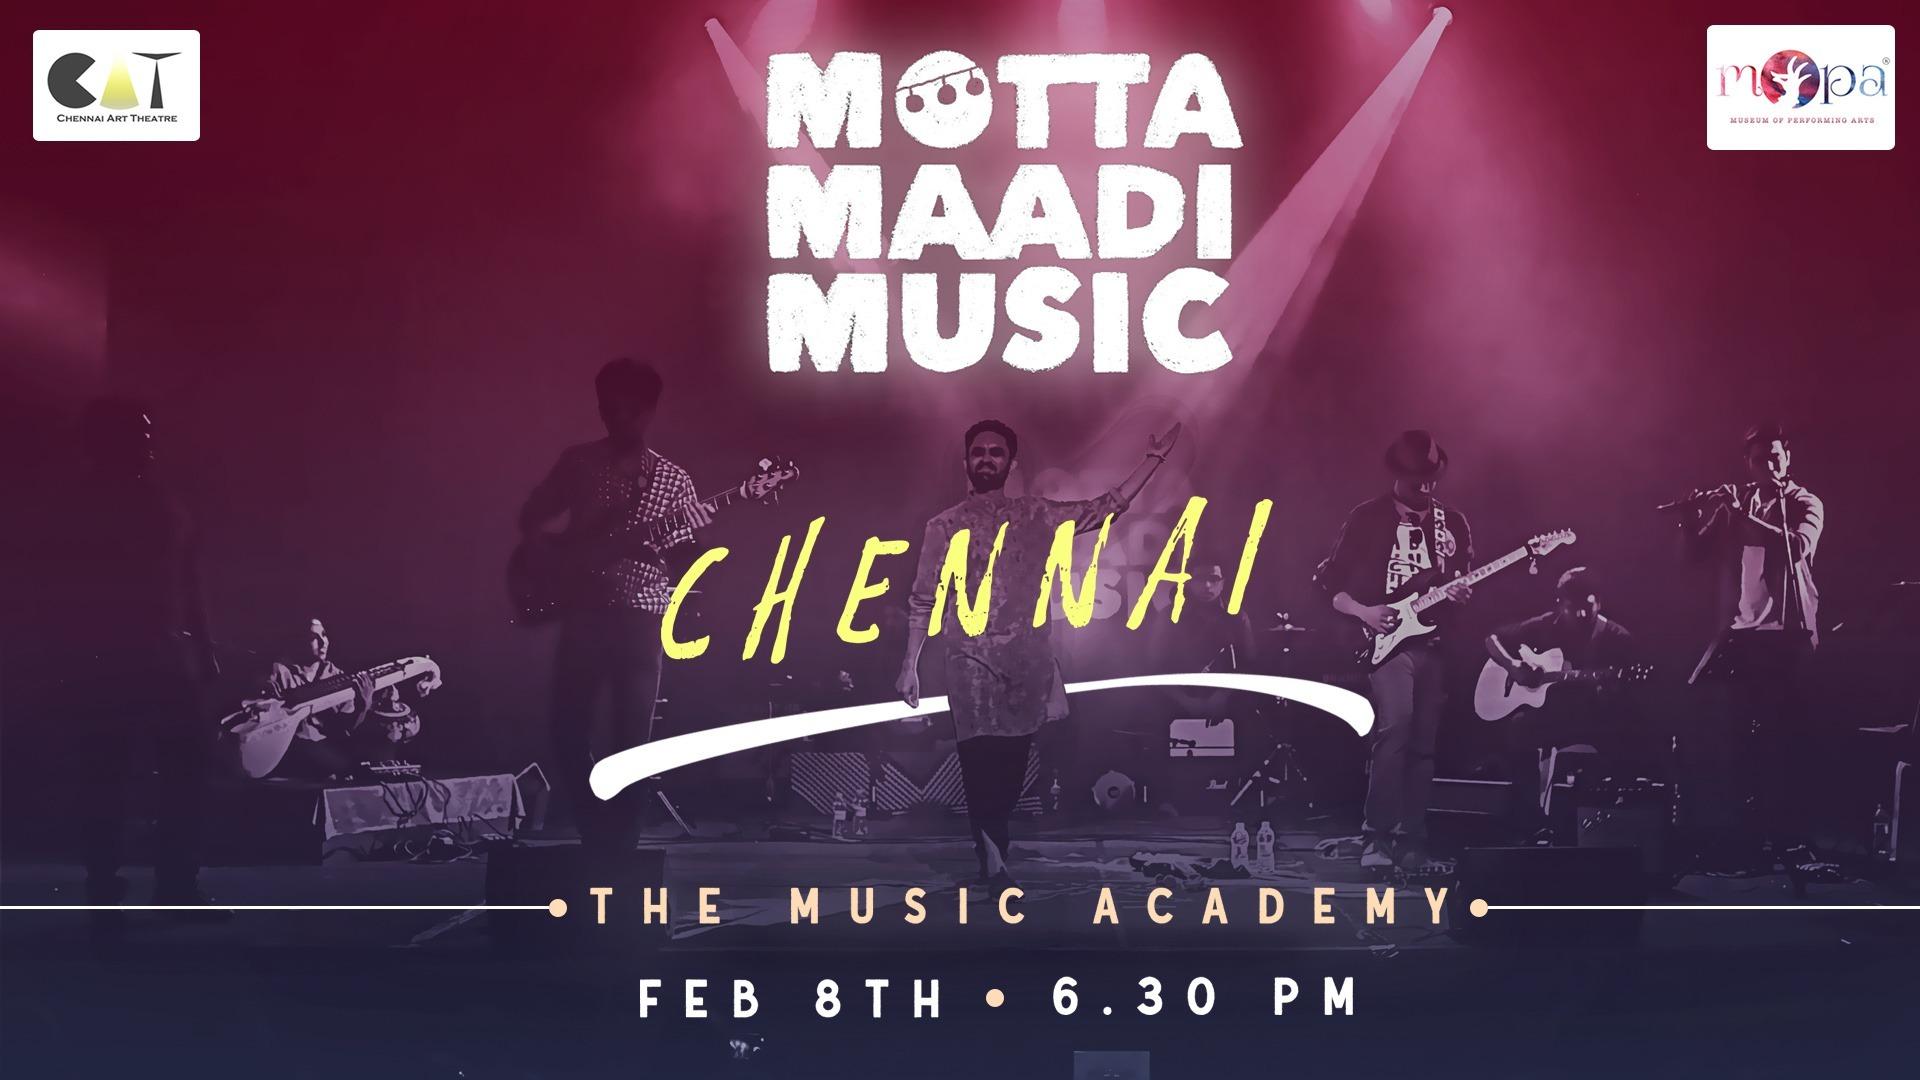 Motta Maadi Music - MOPA Foundation - Music Academy